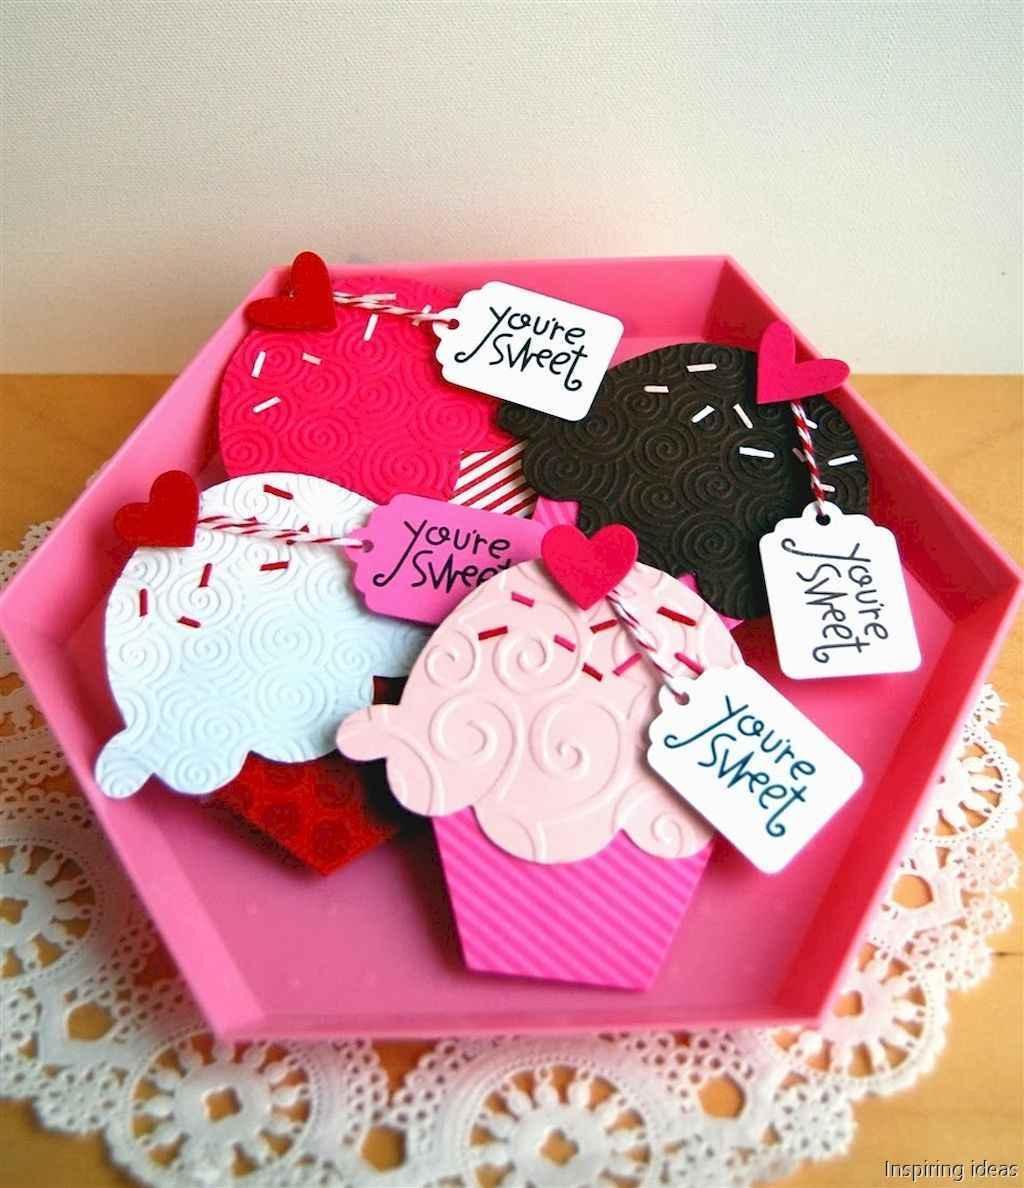 57 unforgetable valentine cards ideas homemade